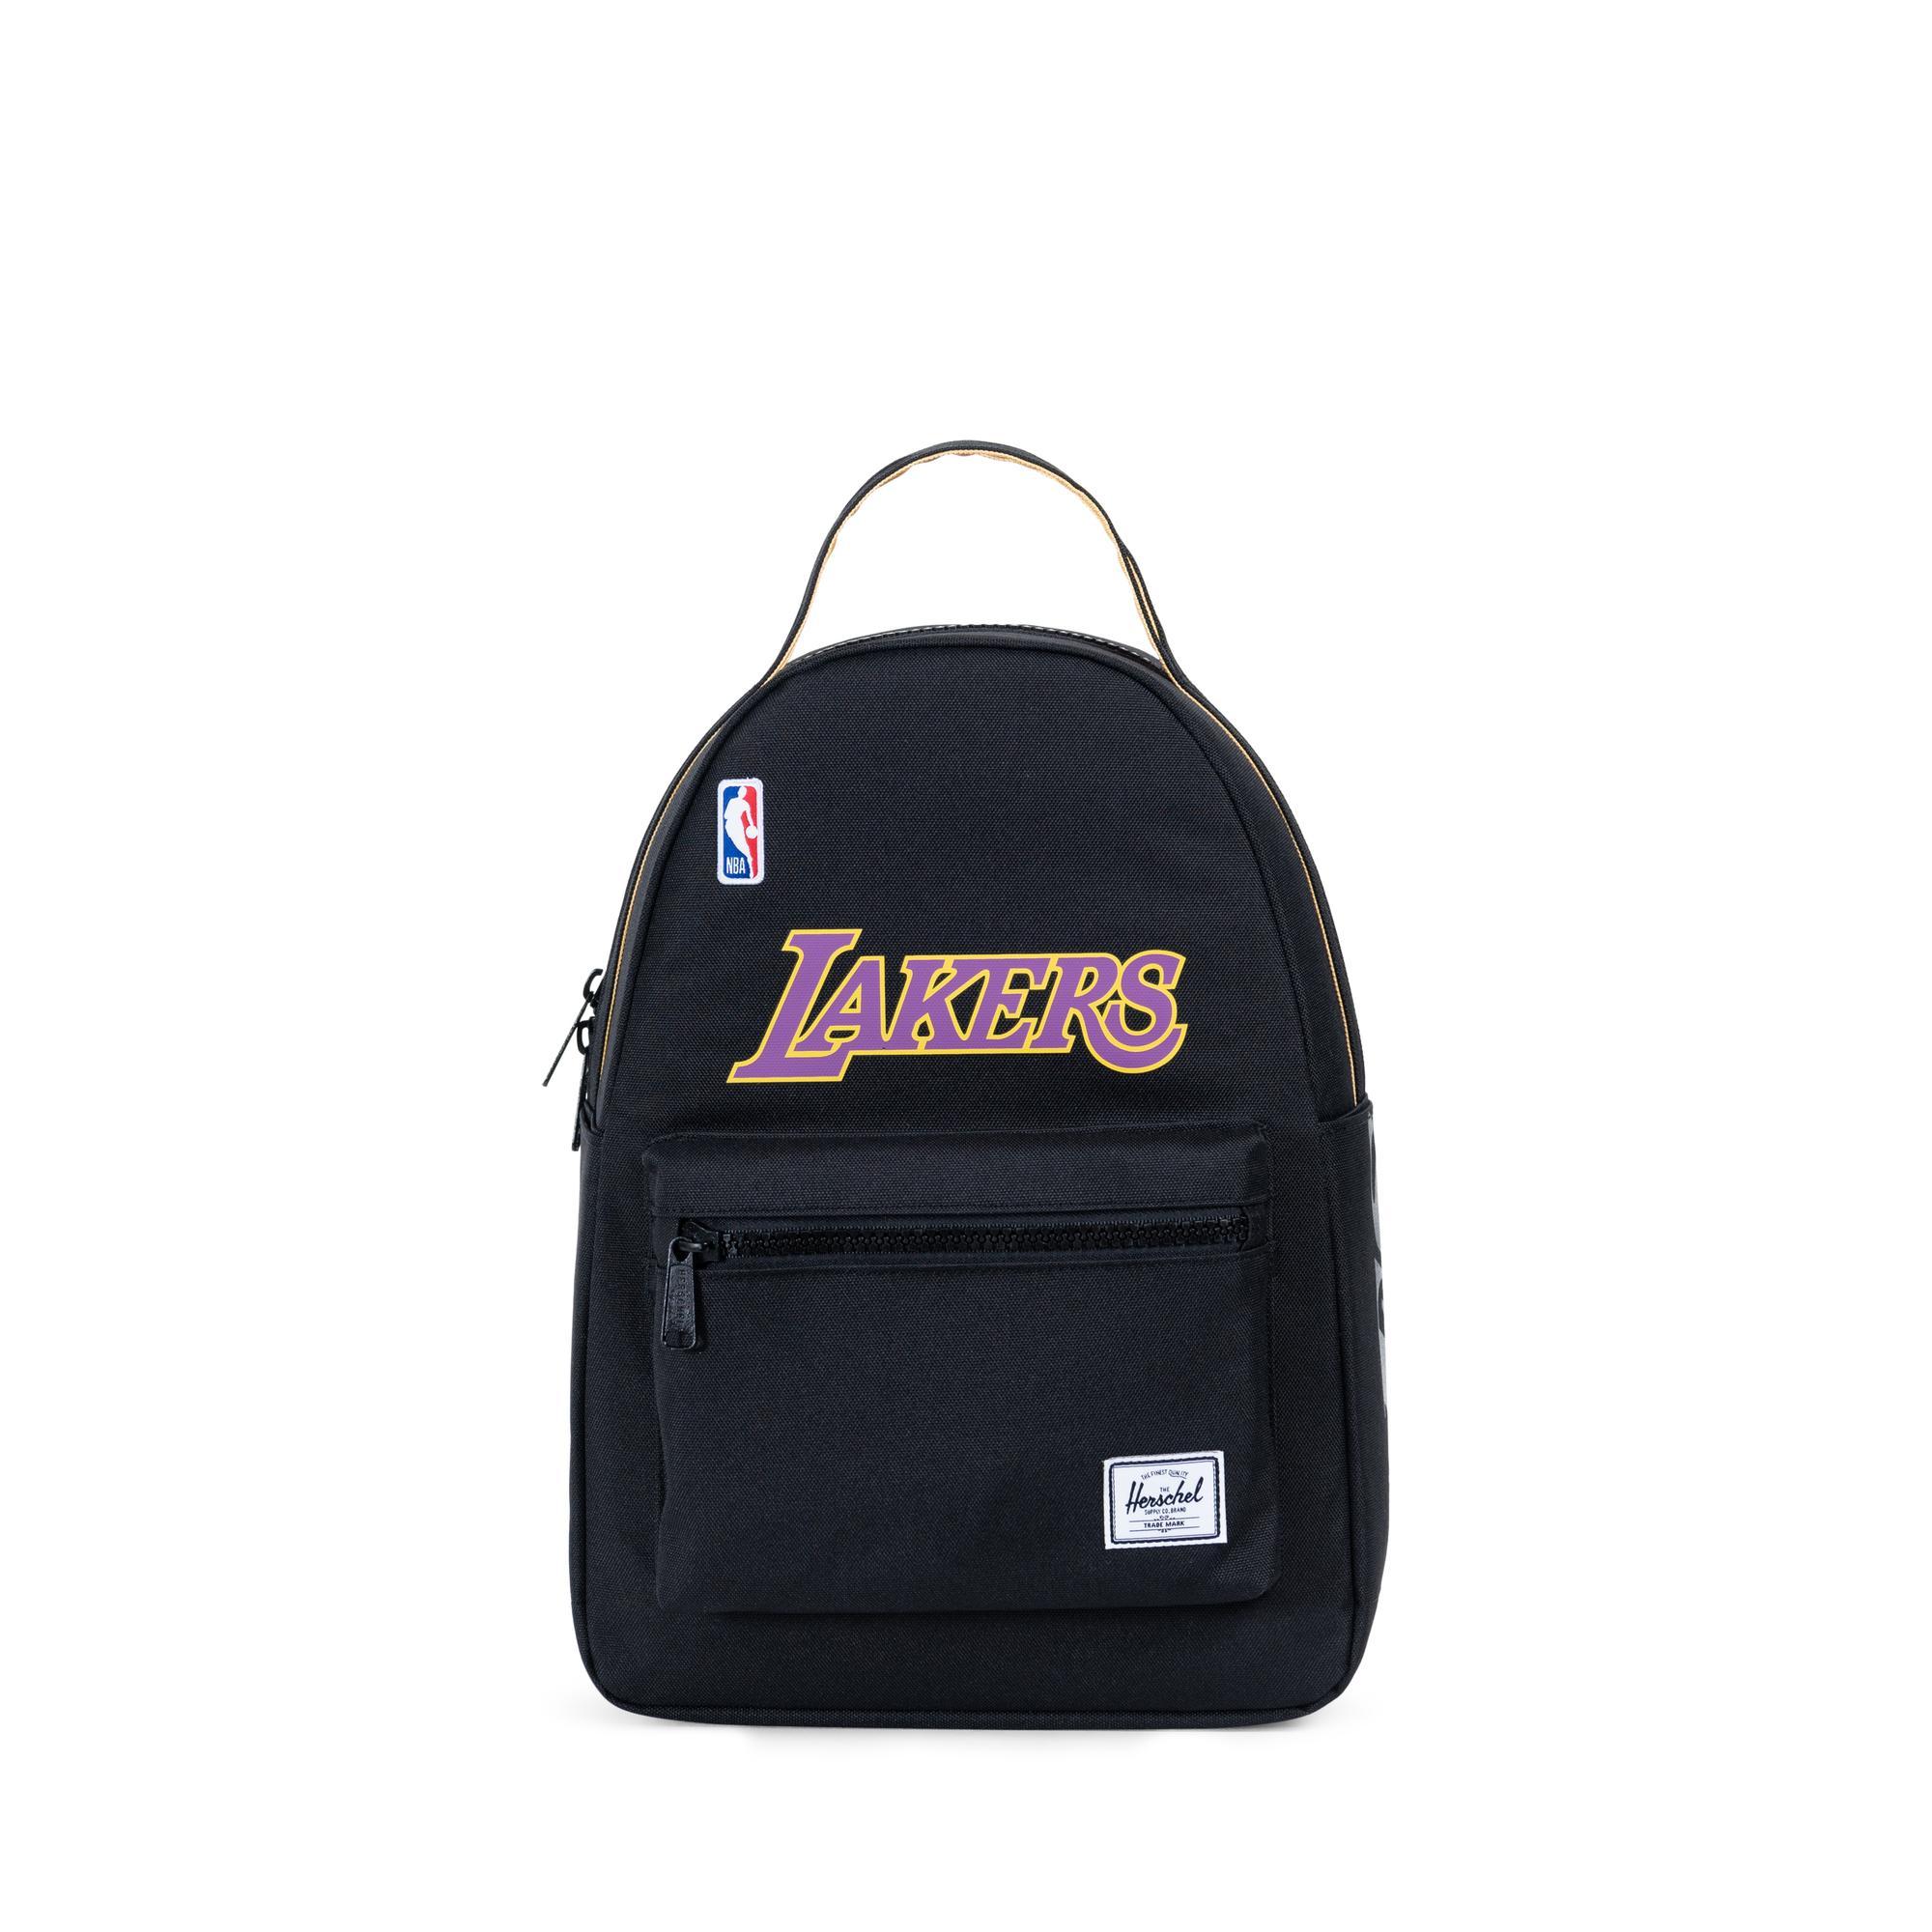 1f3103dc20ad Nova Backpack Small NBA Superfan